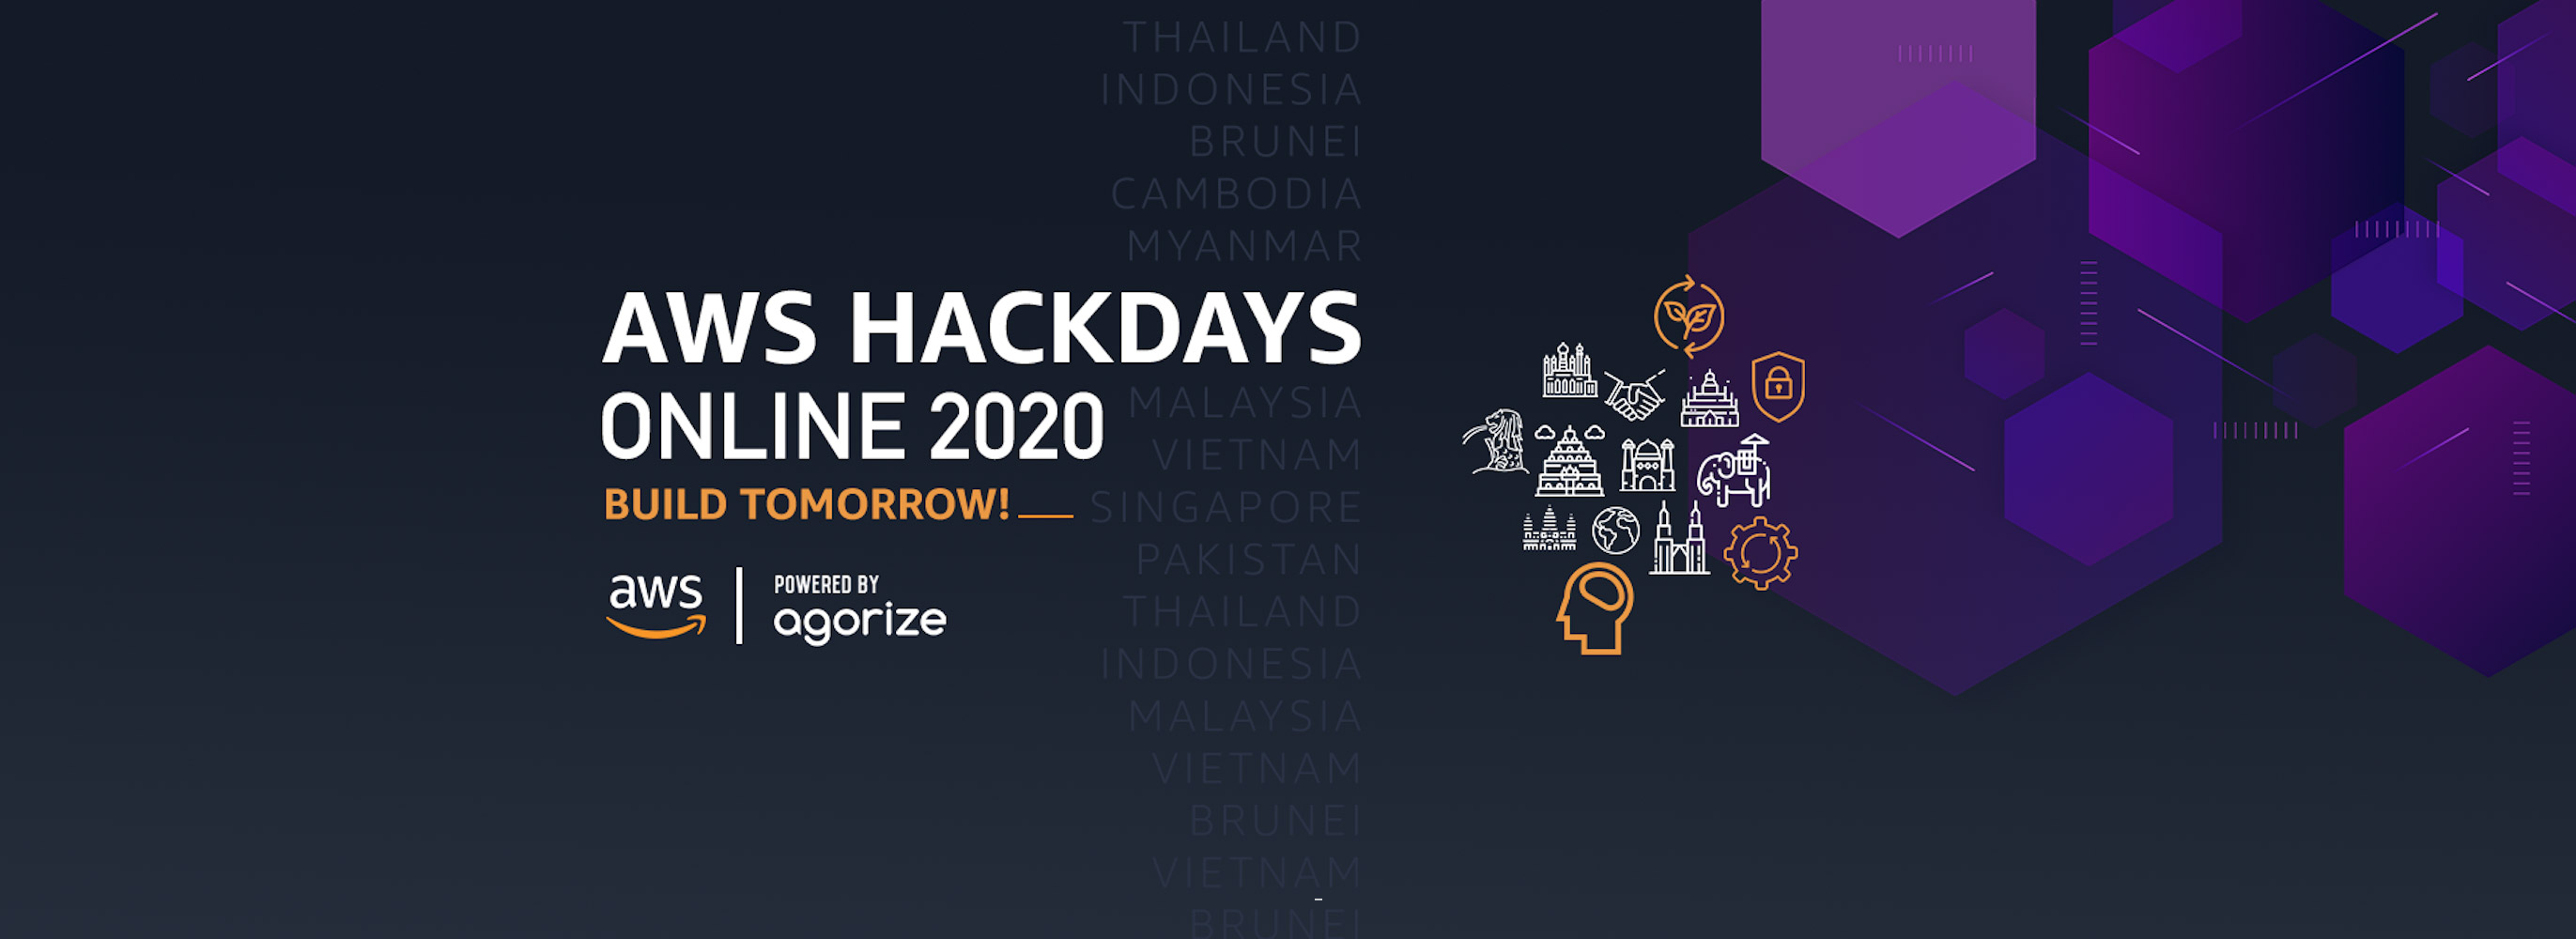 AWS Hackdays Online 2020